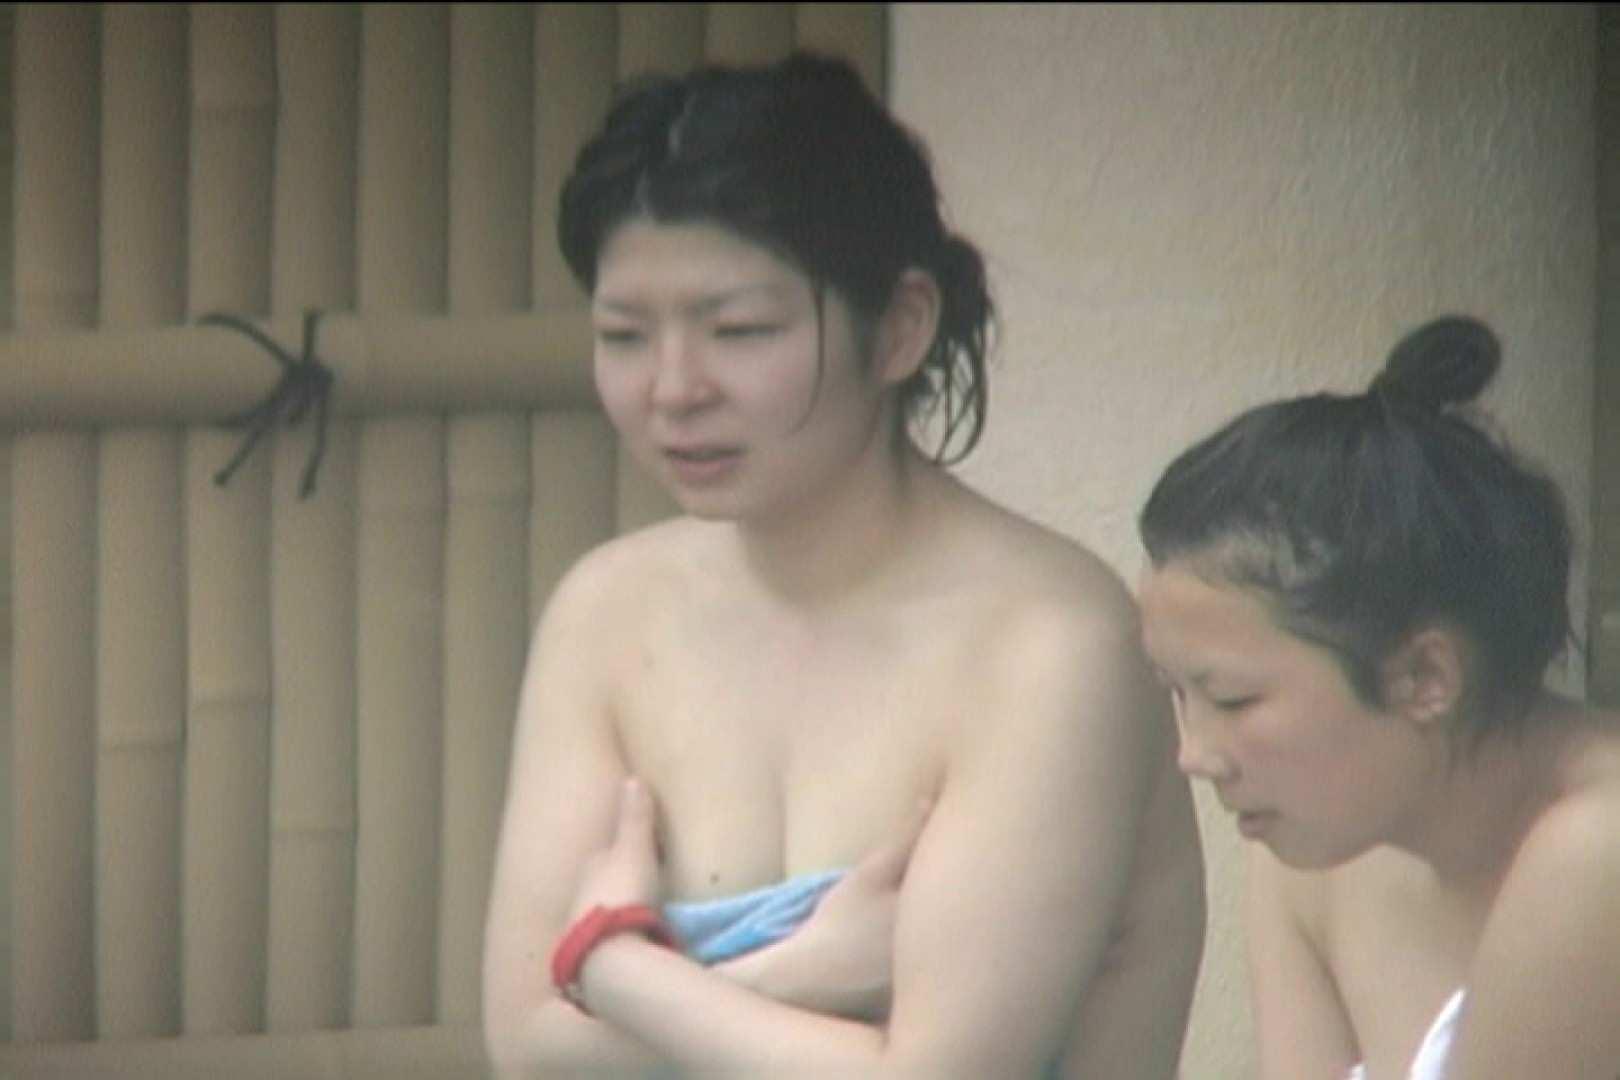 Aquaな露天風呂Vol.139 露天 おまんこ動画流出 63画像 56